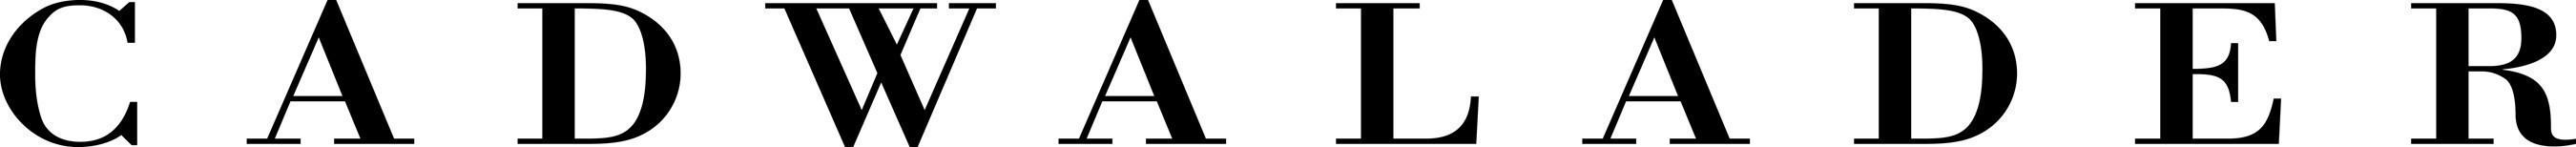 Cadwalader logo